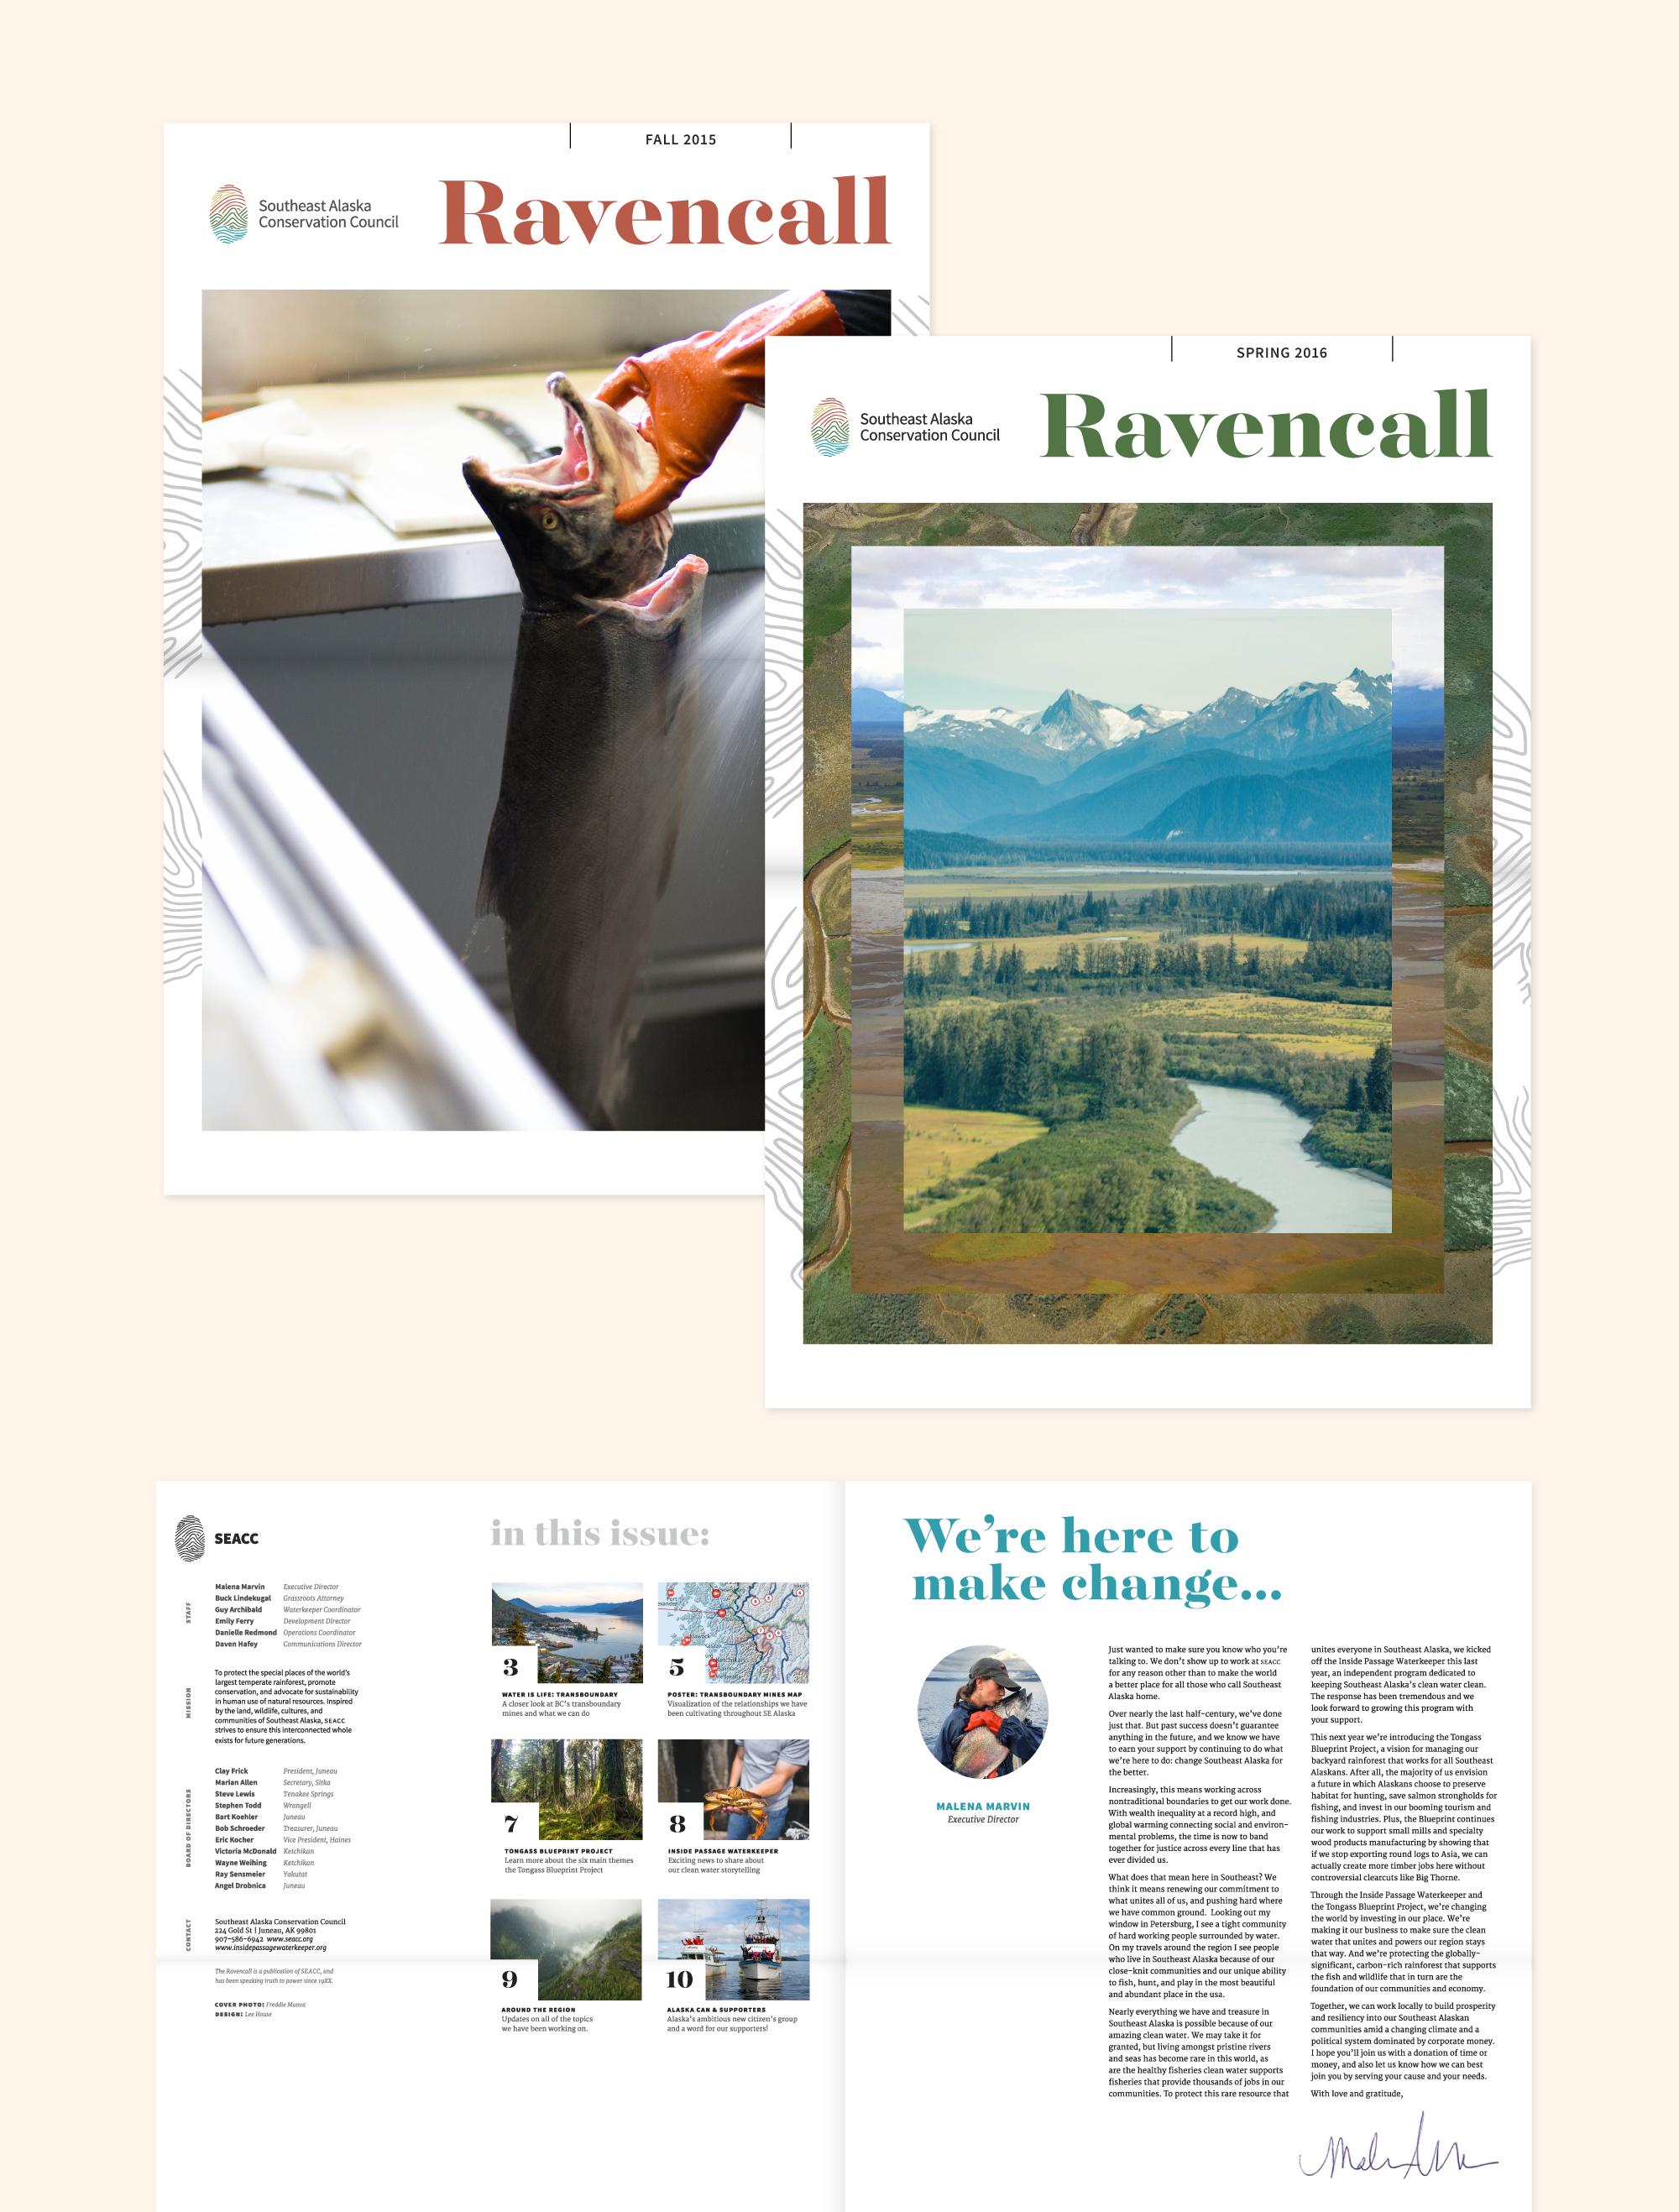 seacc_ravencall_covers@2